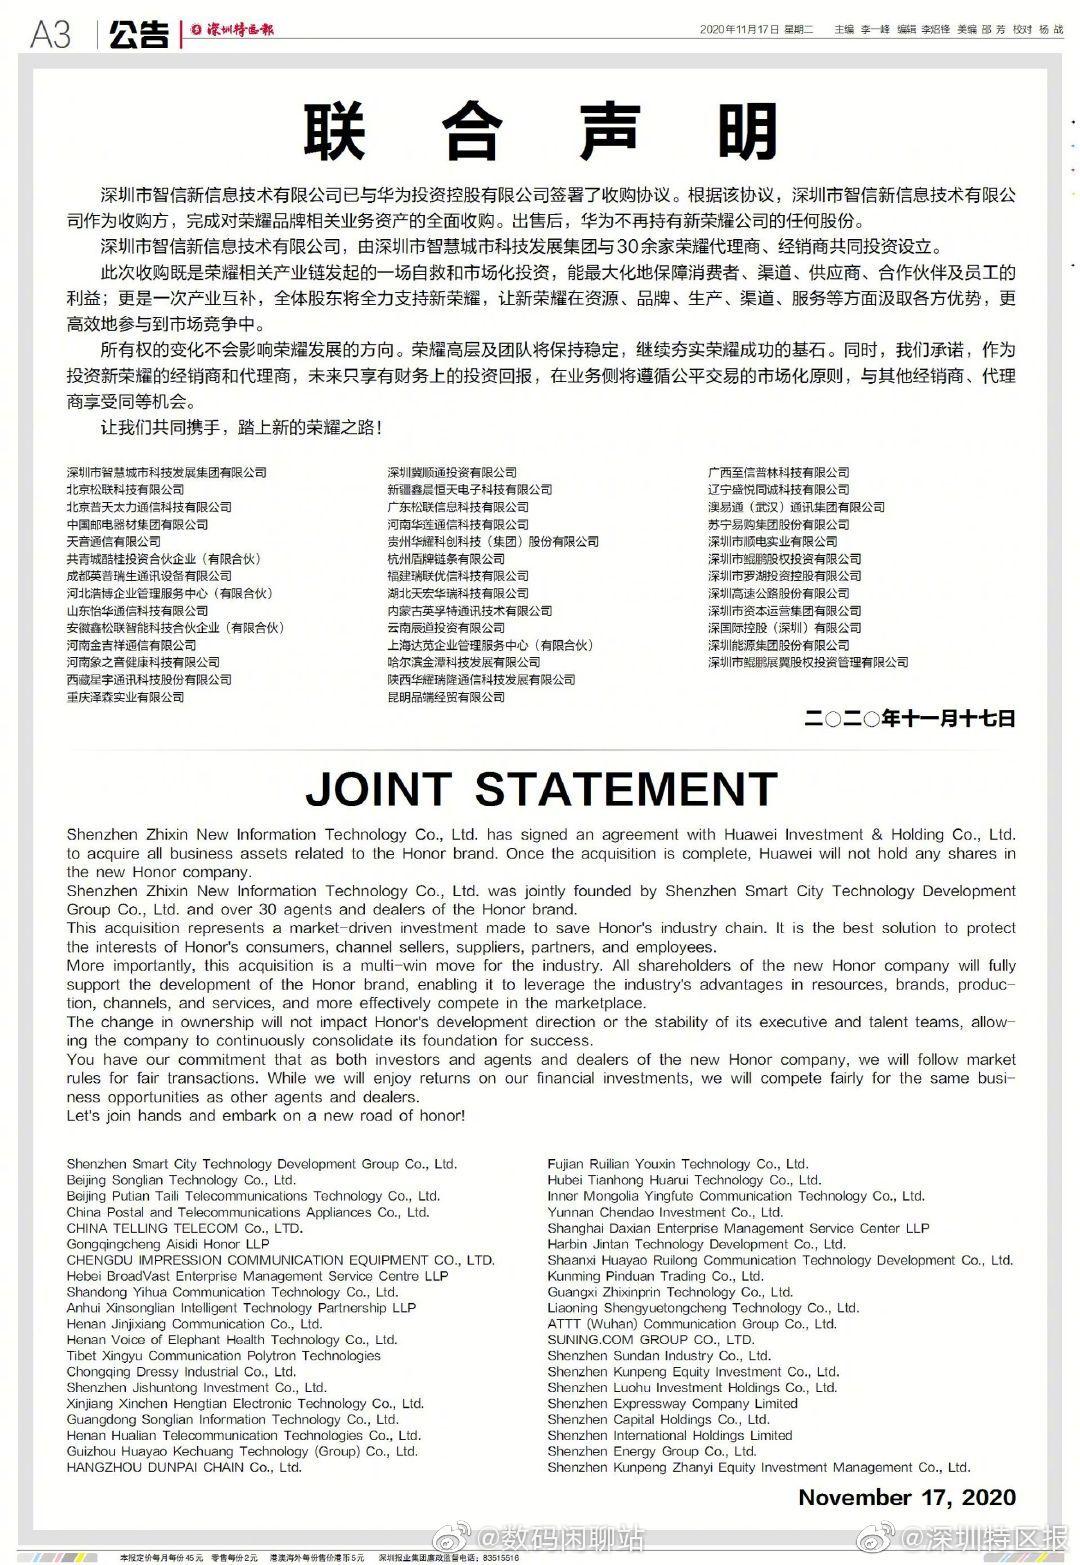 Компания Huawei продала Honor Huawei  - oficialno_huawei_prodala_honor_i_vse_chto_s_nim_svazano_picture7_0